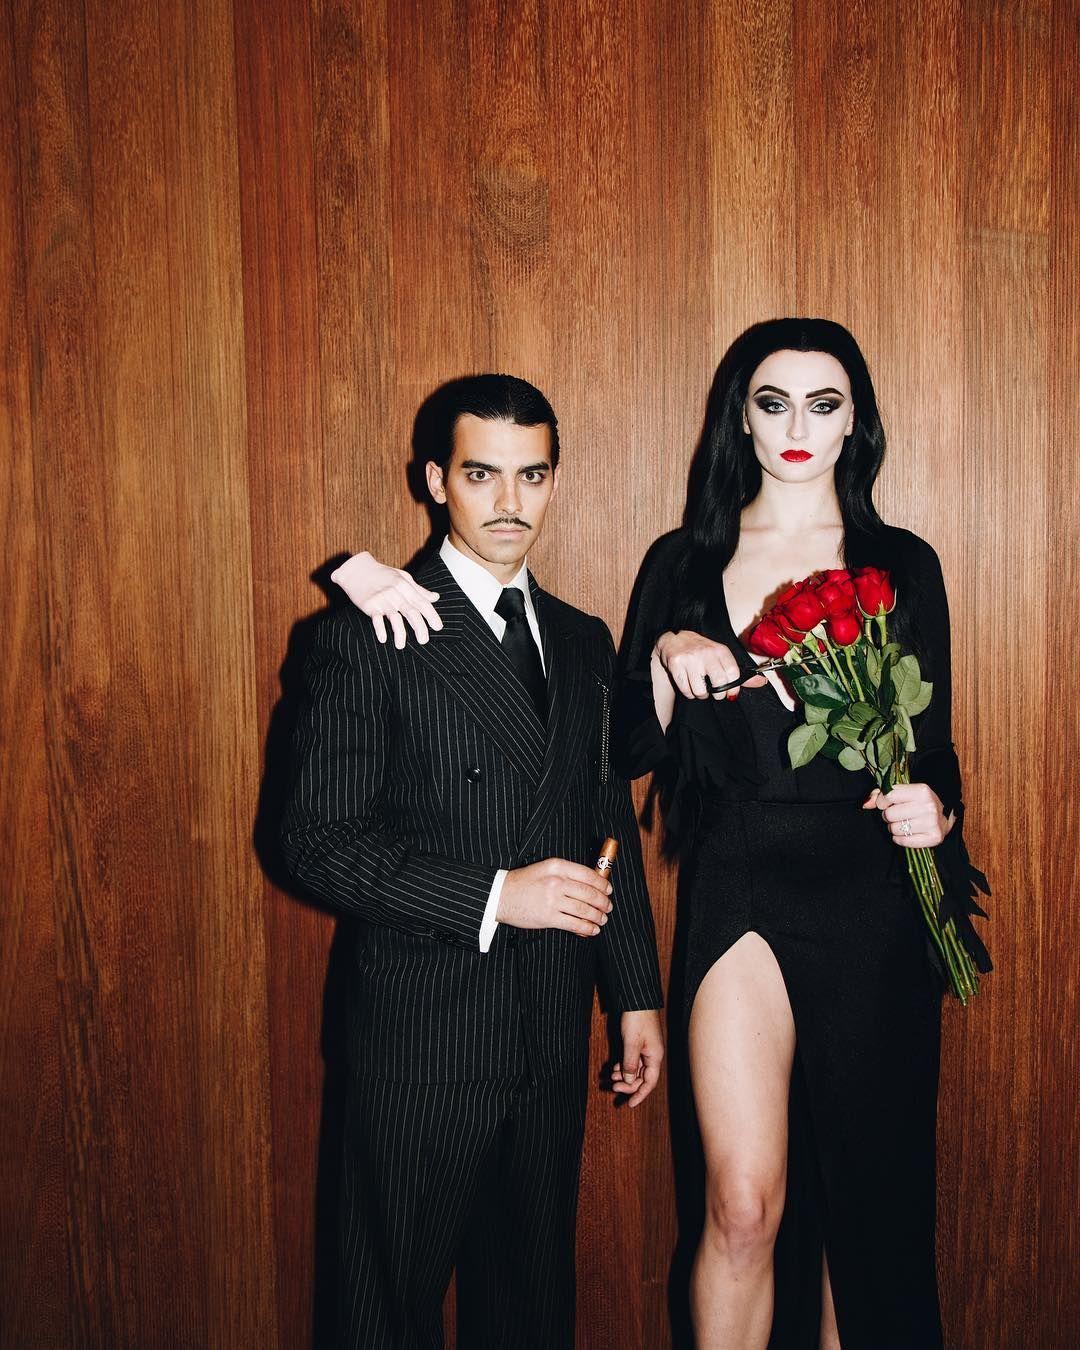 Celerbity Halloween Costumes 2020 101 Best Celebrity Couples Costume Ideas For Halloween 2020